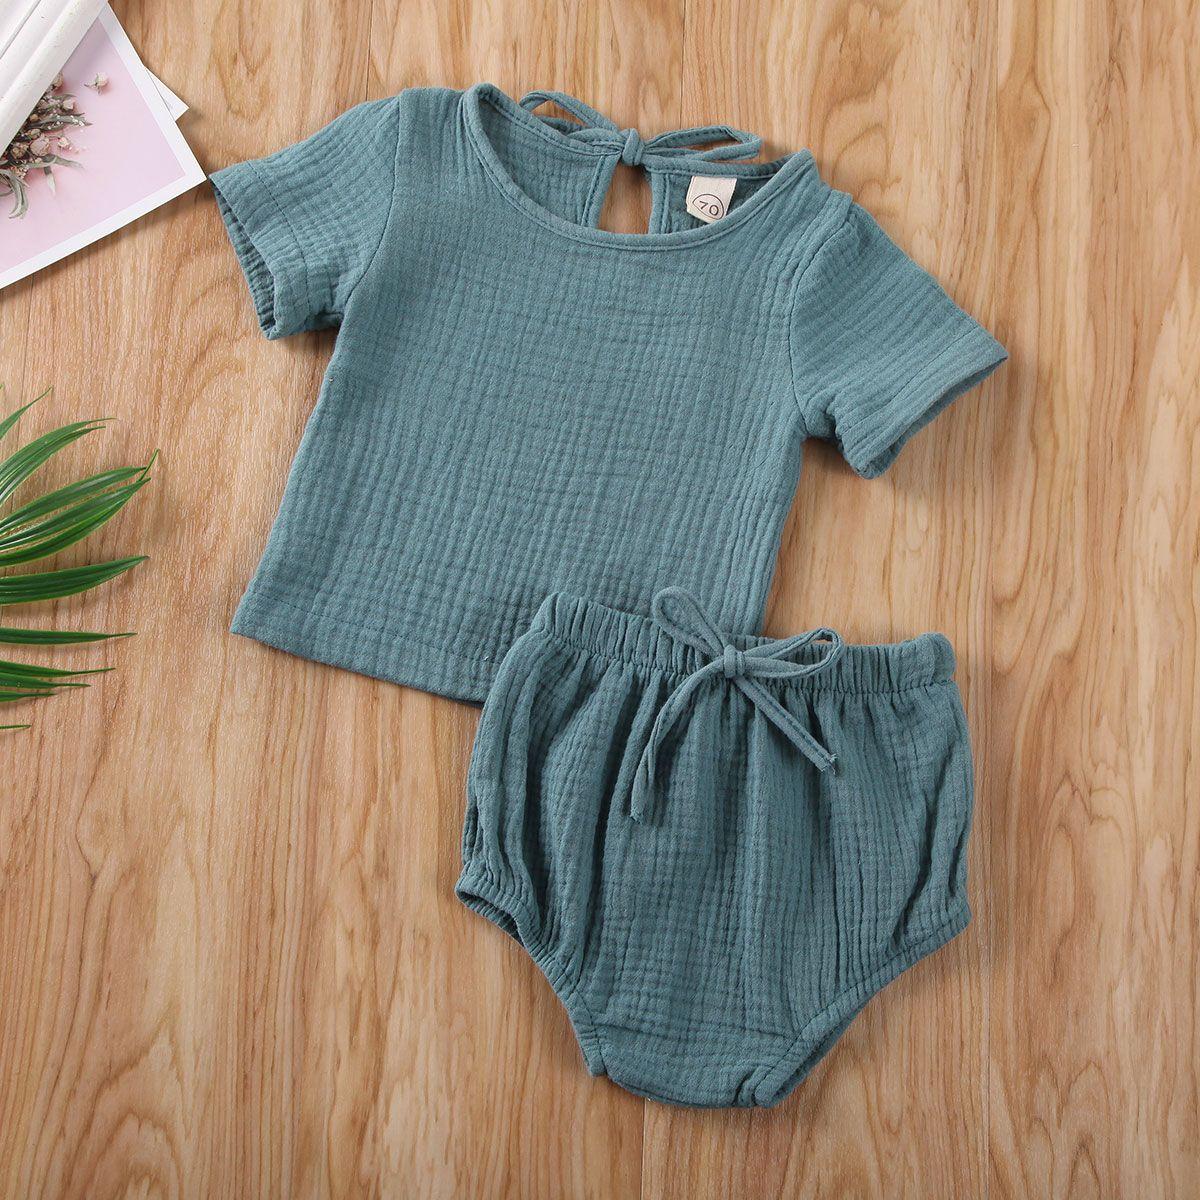 Baby sommer kleidung junge kleidung set baby mädchen baumwollinen tops + kinder shorts neugeborene hosen solide 2 stücke kurze hülse outfits